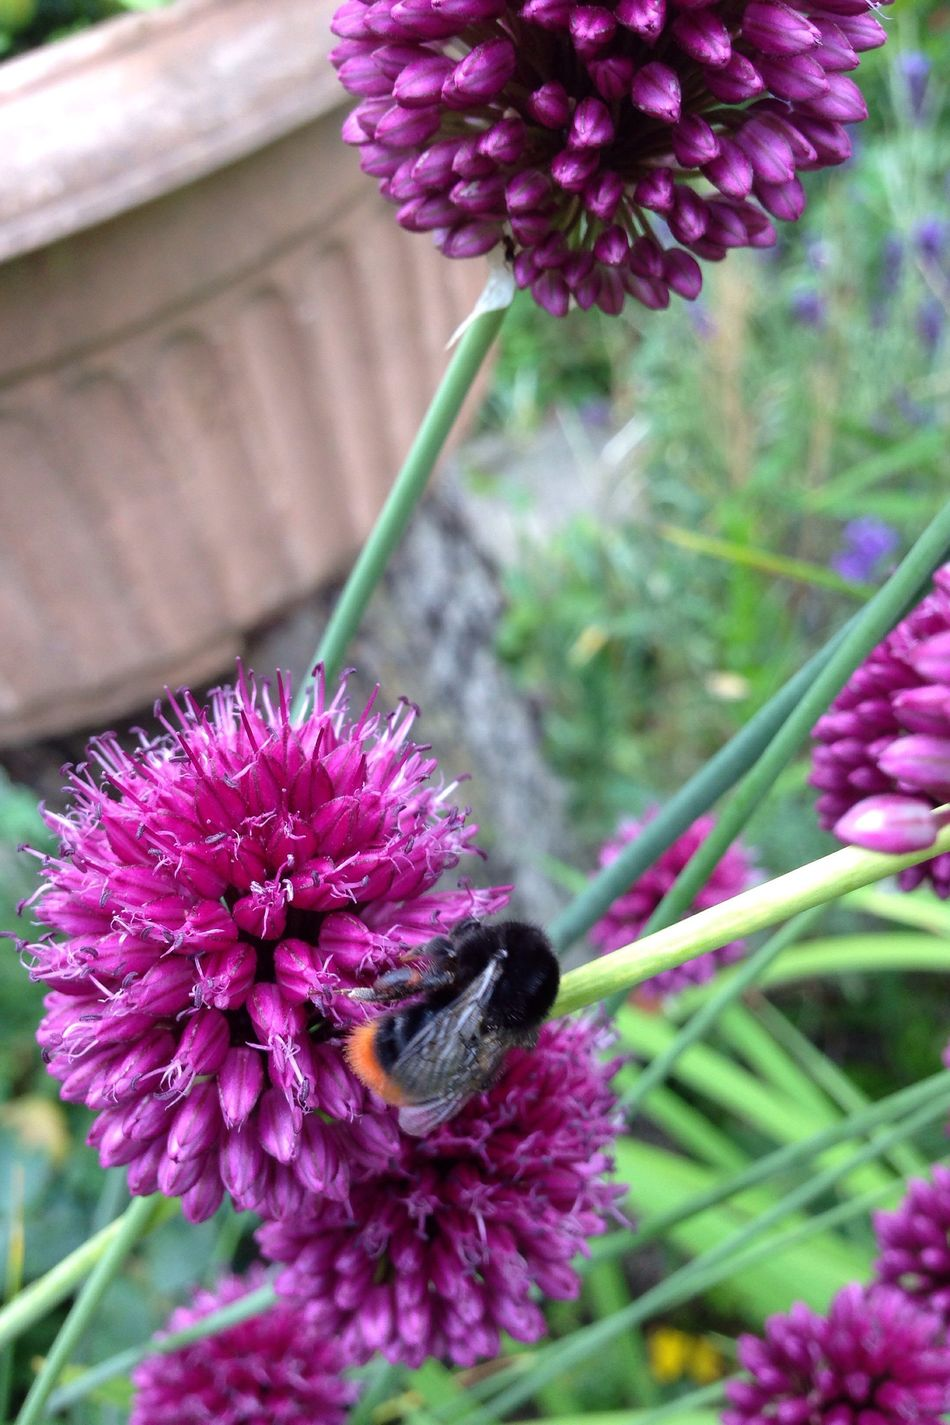 Lauch Kugellauch Zierlauch Garden Photography Garden Allium Flower Allium Sphaerocephalon Garten Pflanze Natur Bumble Bee Bumblebee Hummel